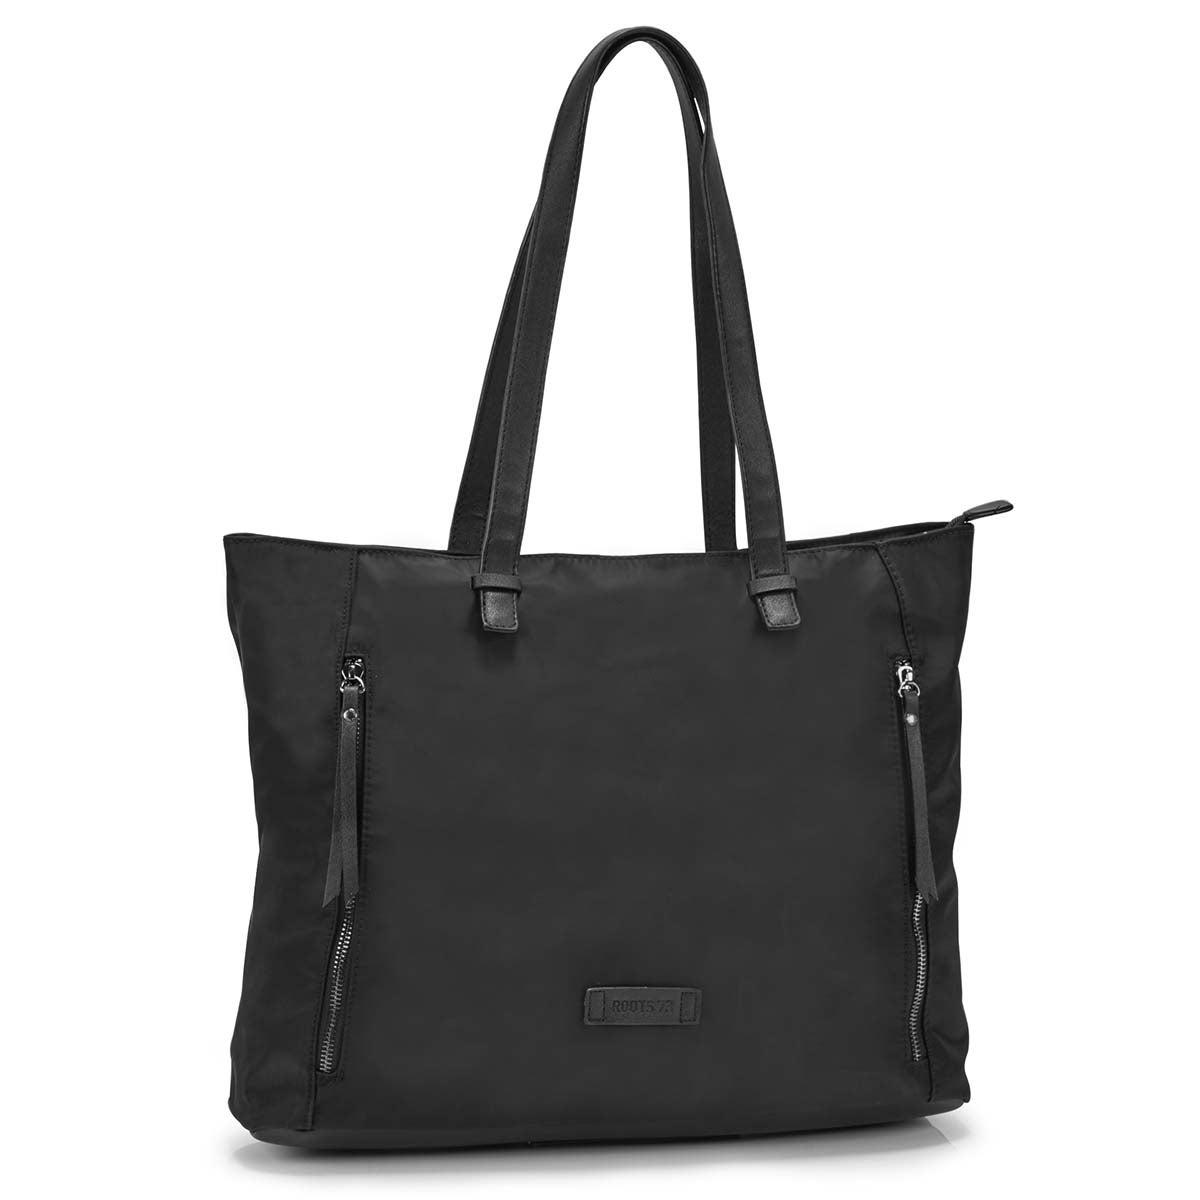 Women's R5483 black large tote bag